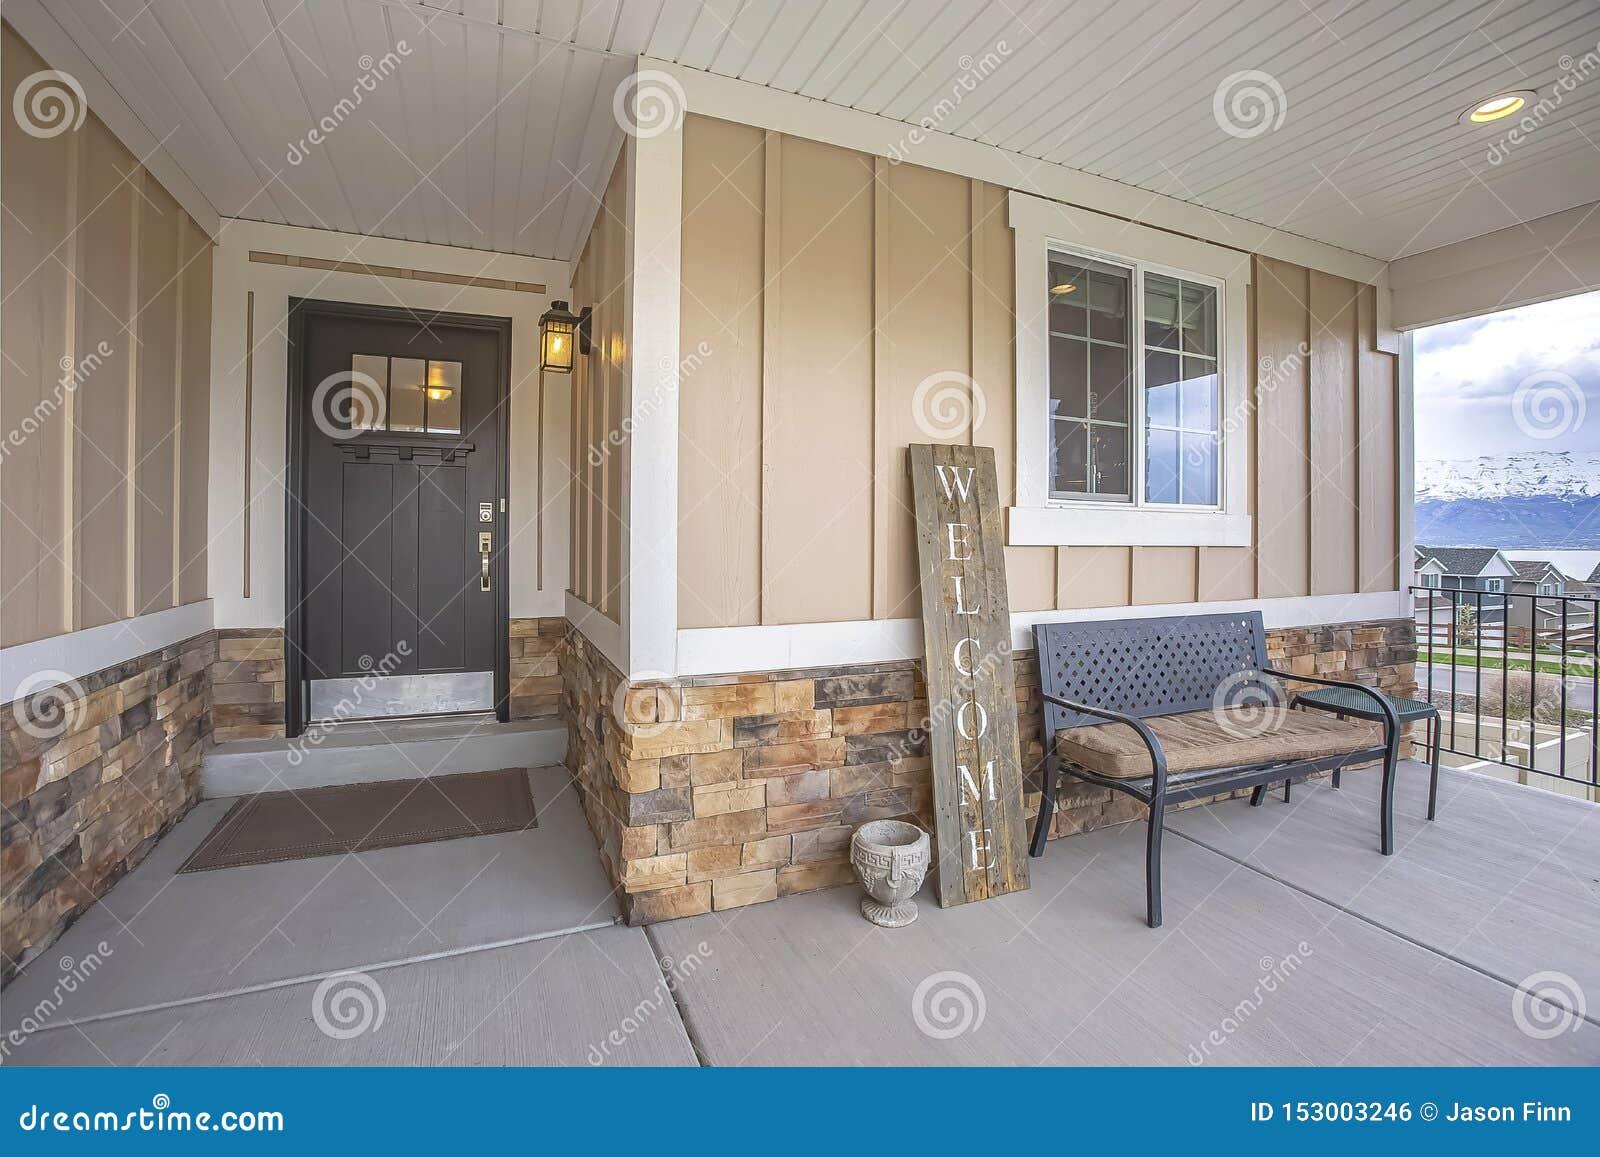 Het huis buiten met portiek en glas paned houten voordeur